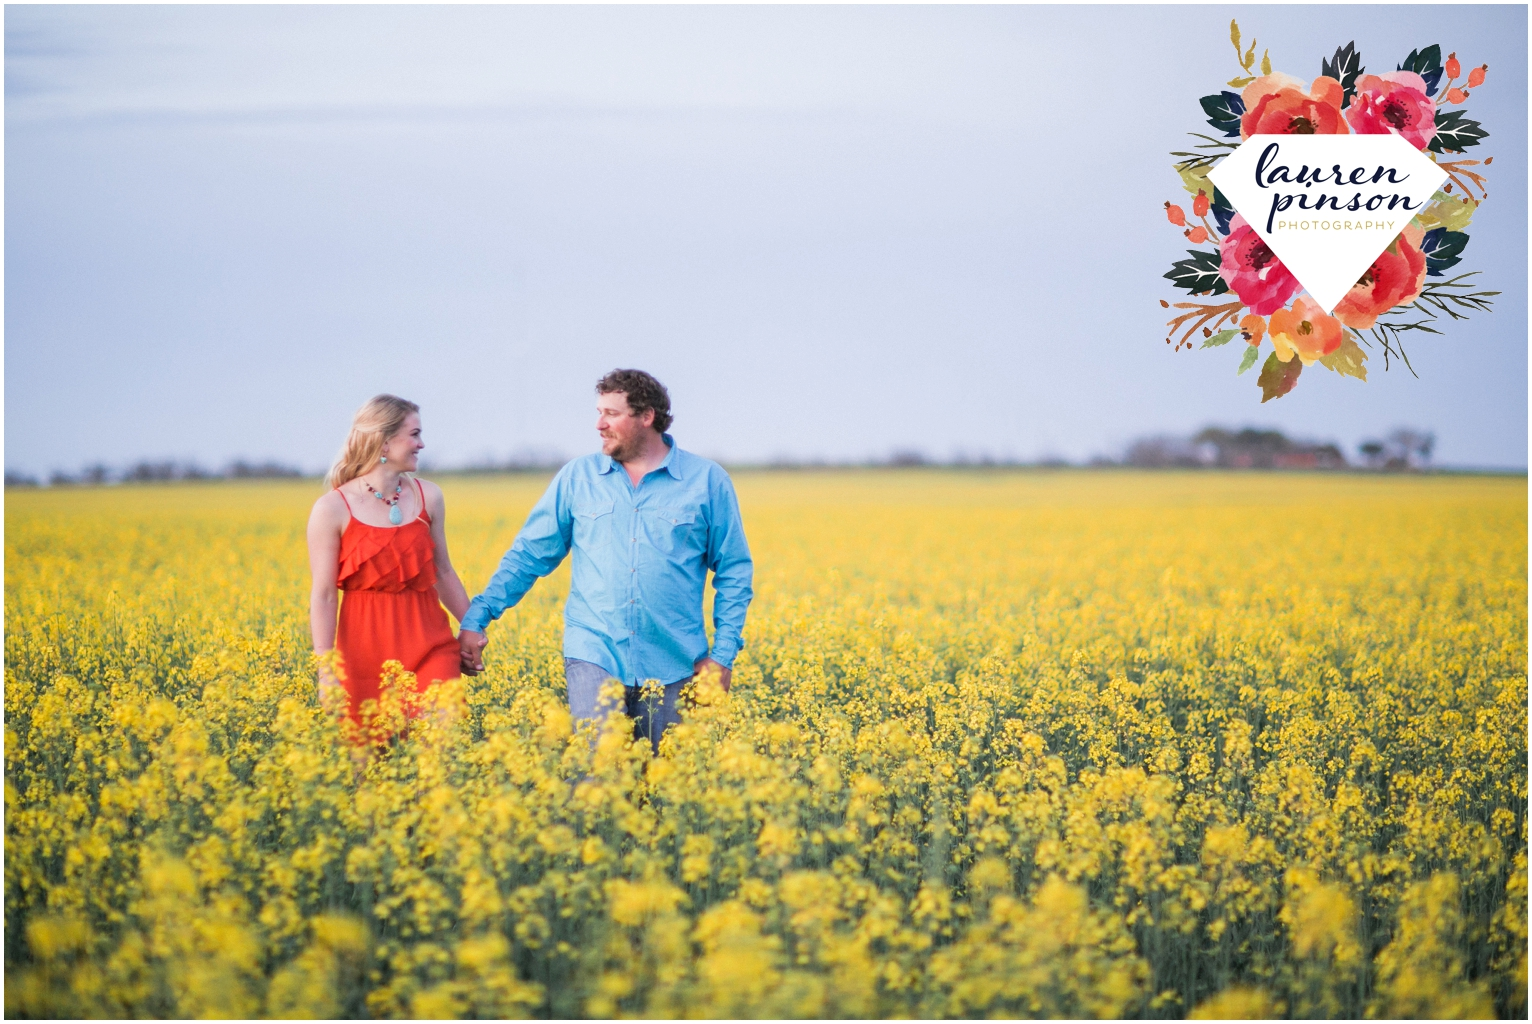 wichita-falls-wedding-photographer-engagement-session-texas-photography-oklahoma-engagement-wedding-photography_0629.jpg